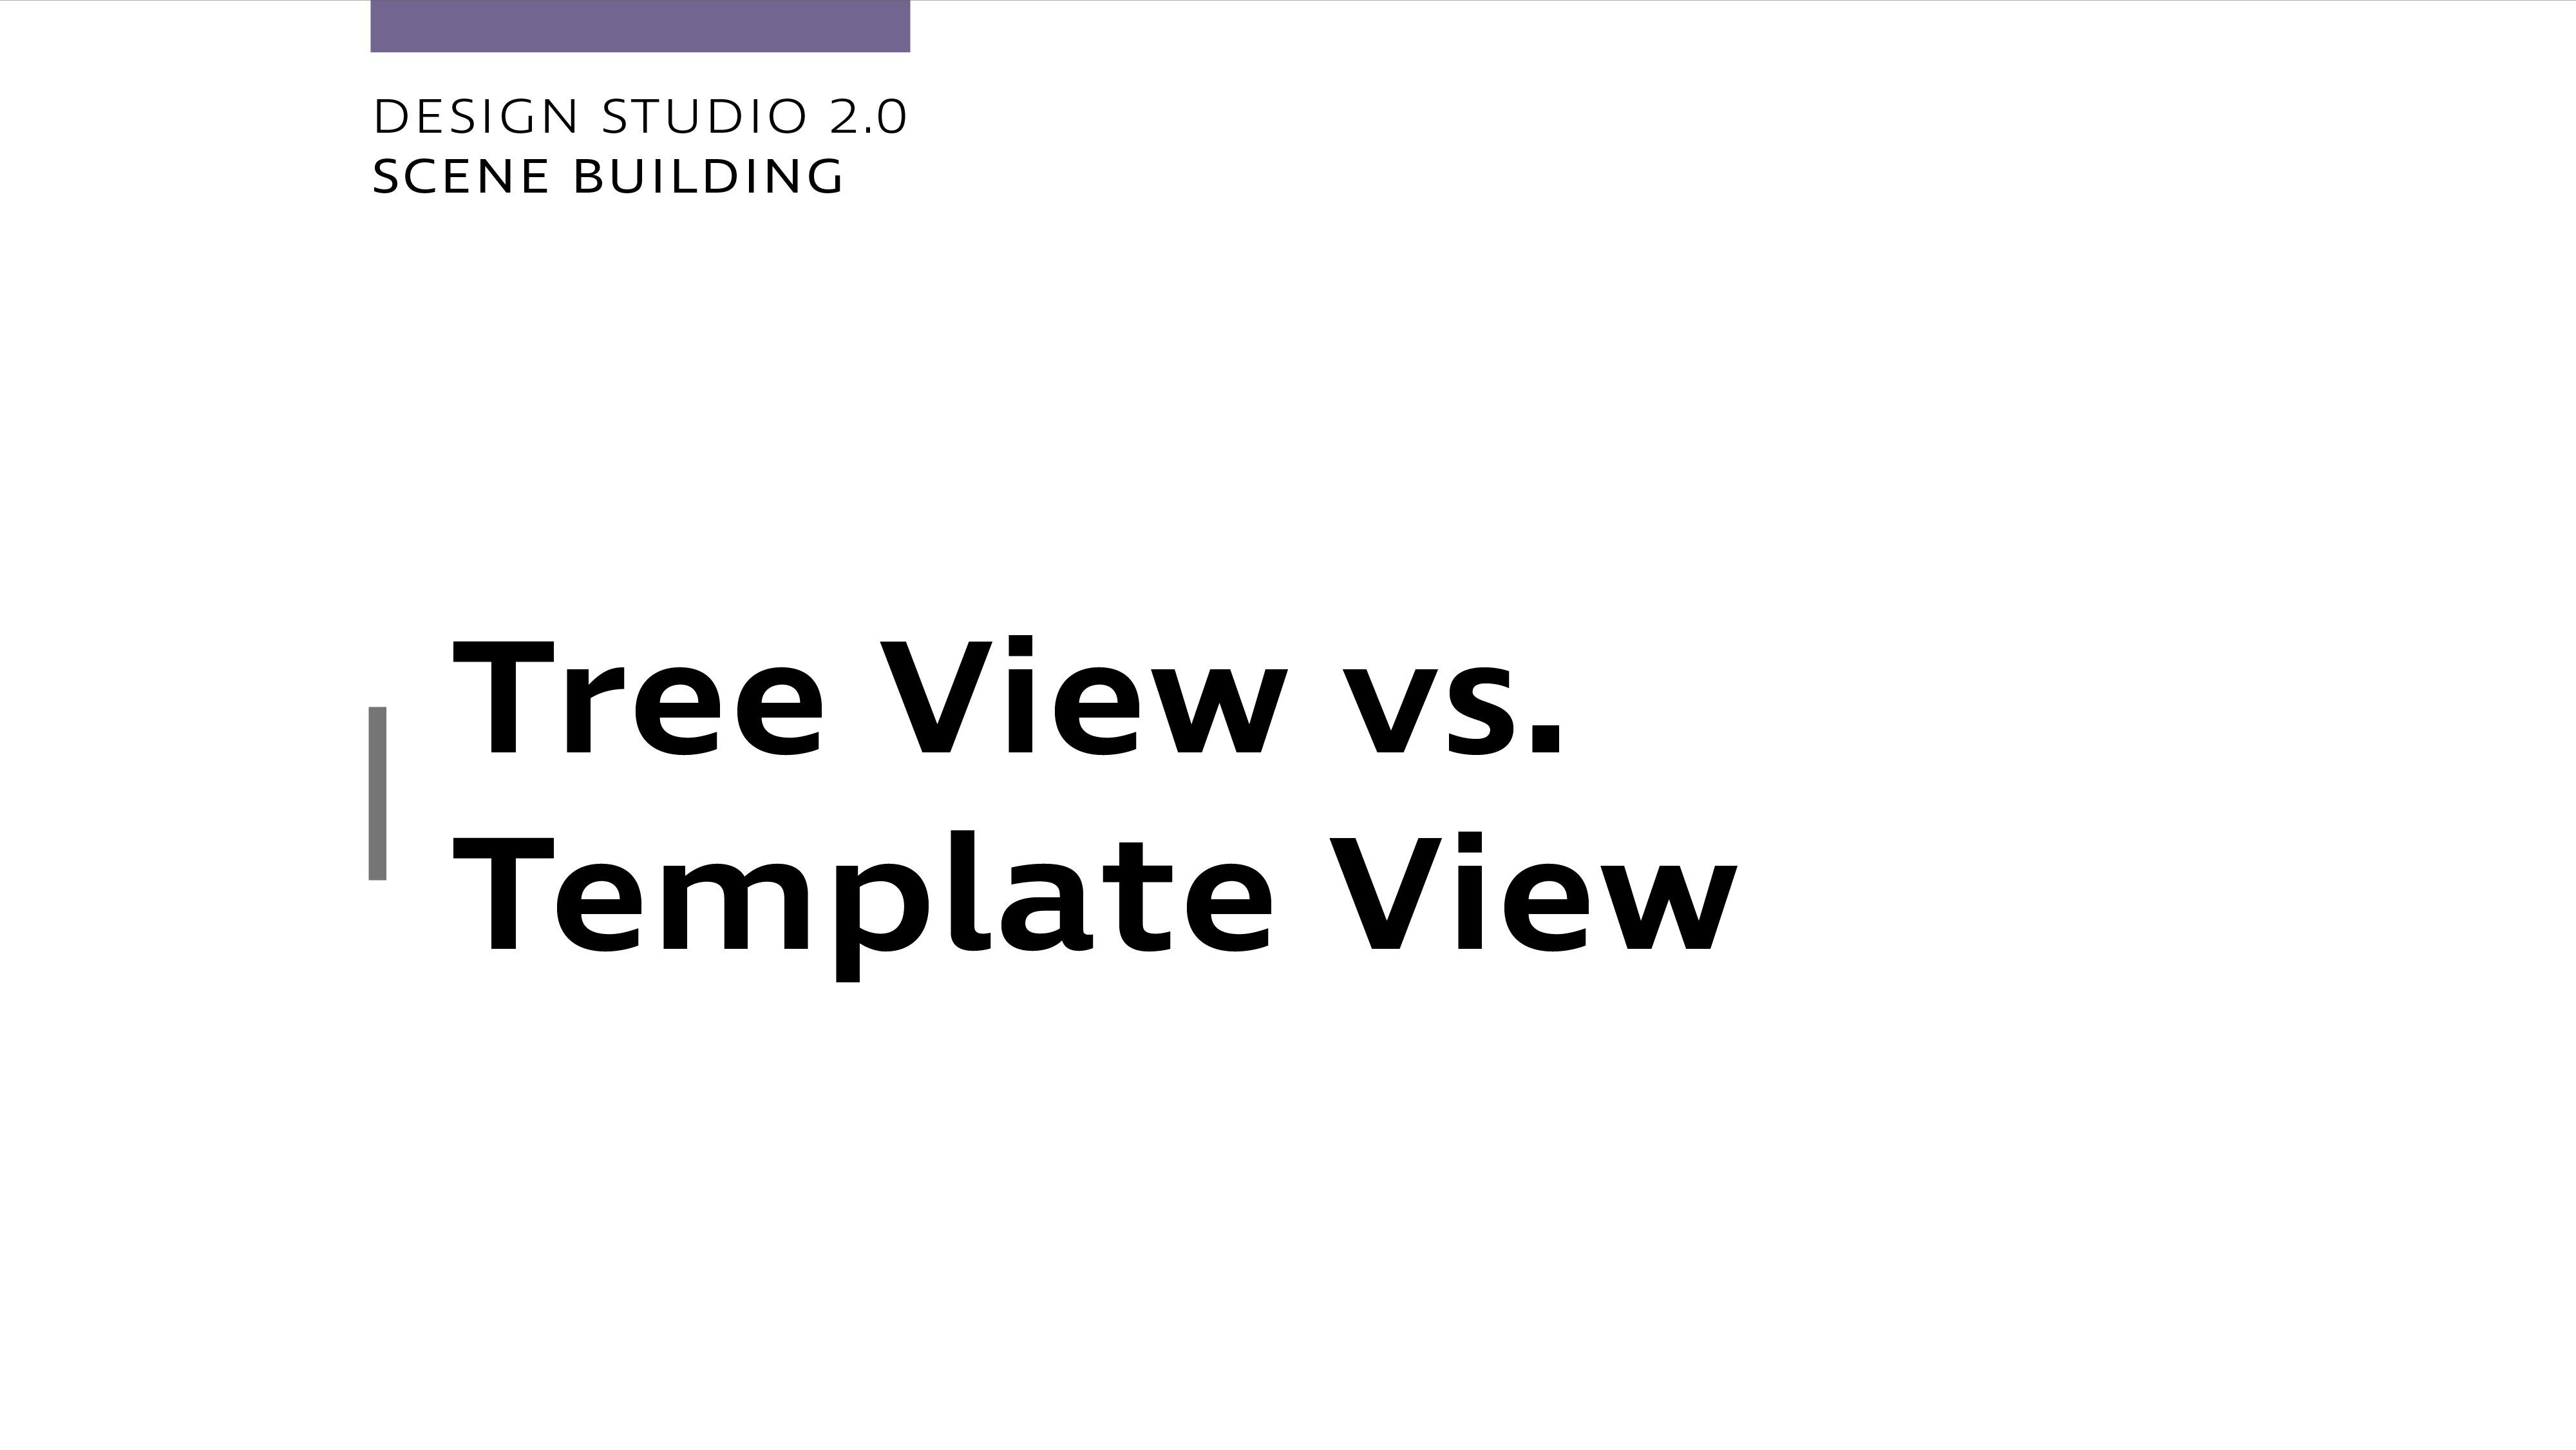 Design Studio 2.0 - Tree View vs. Template View